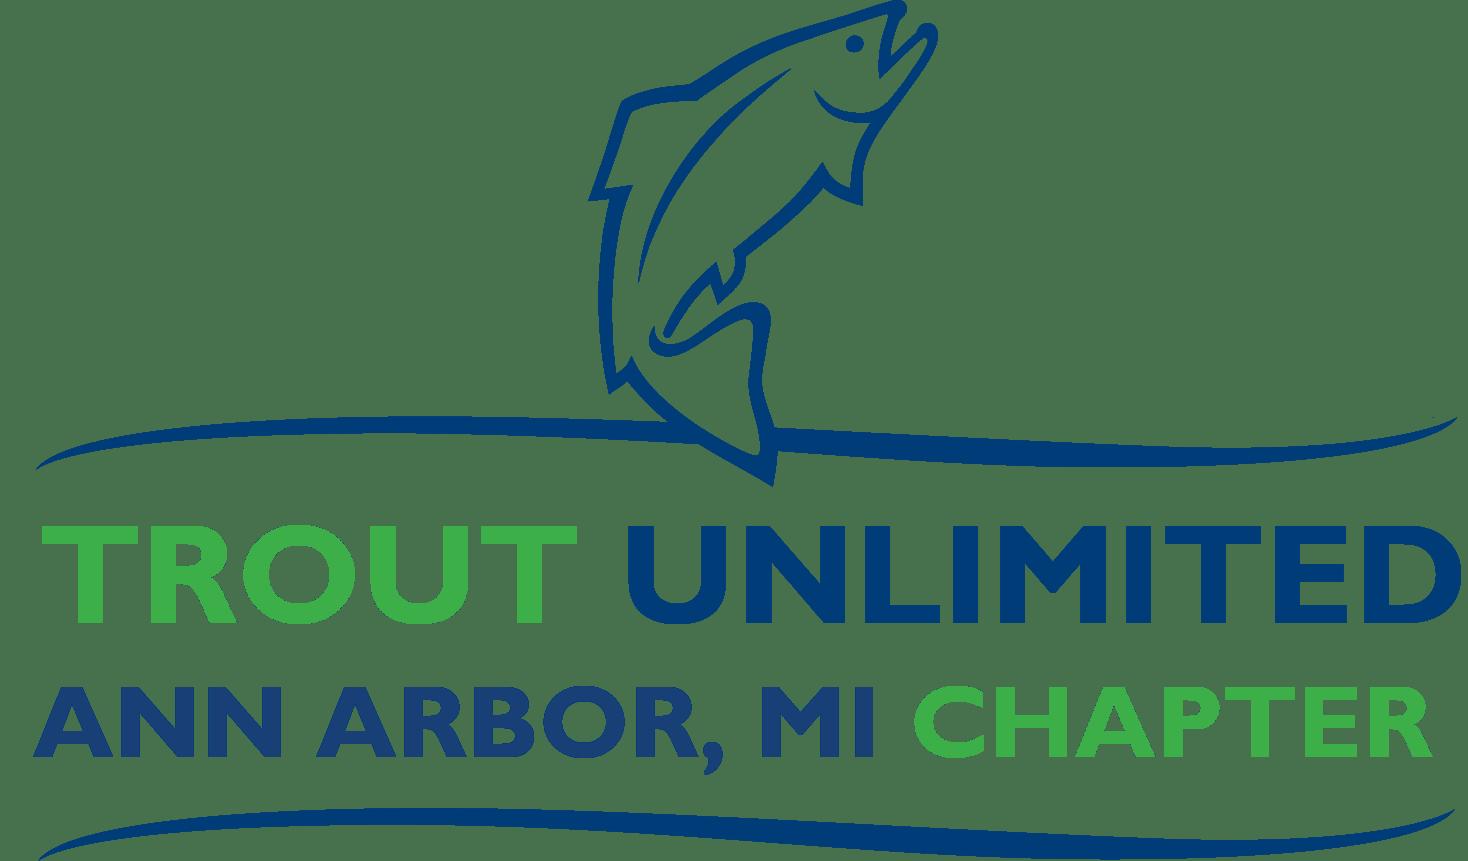 Ann Arbor Area Trout Unlimited logo